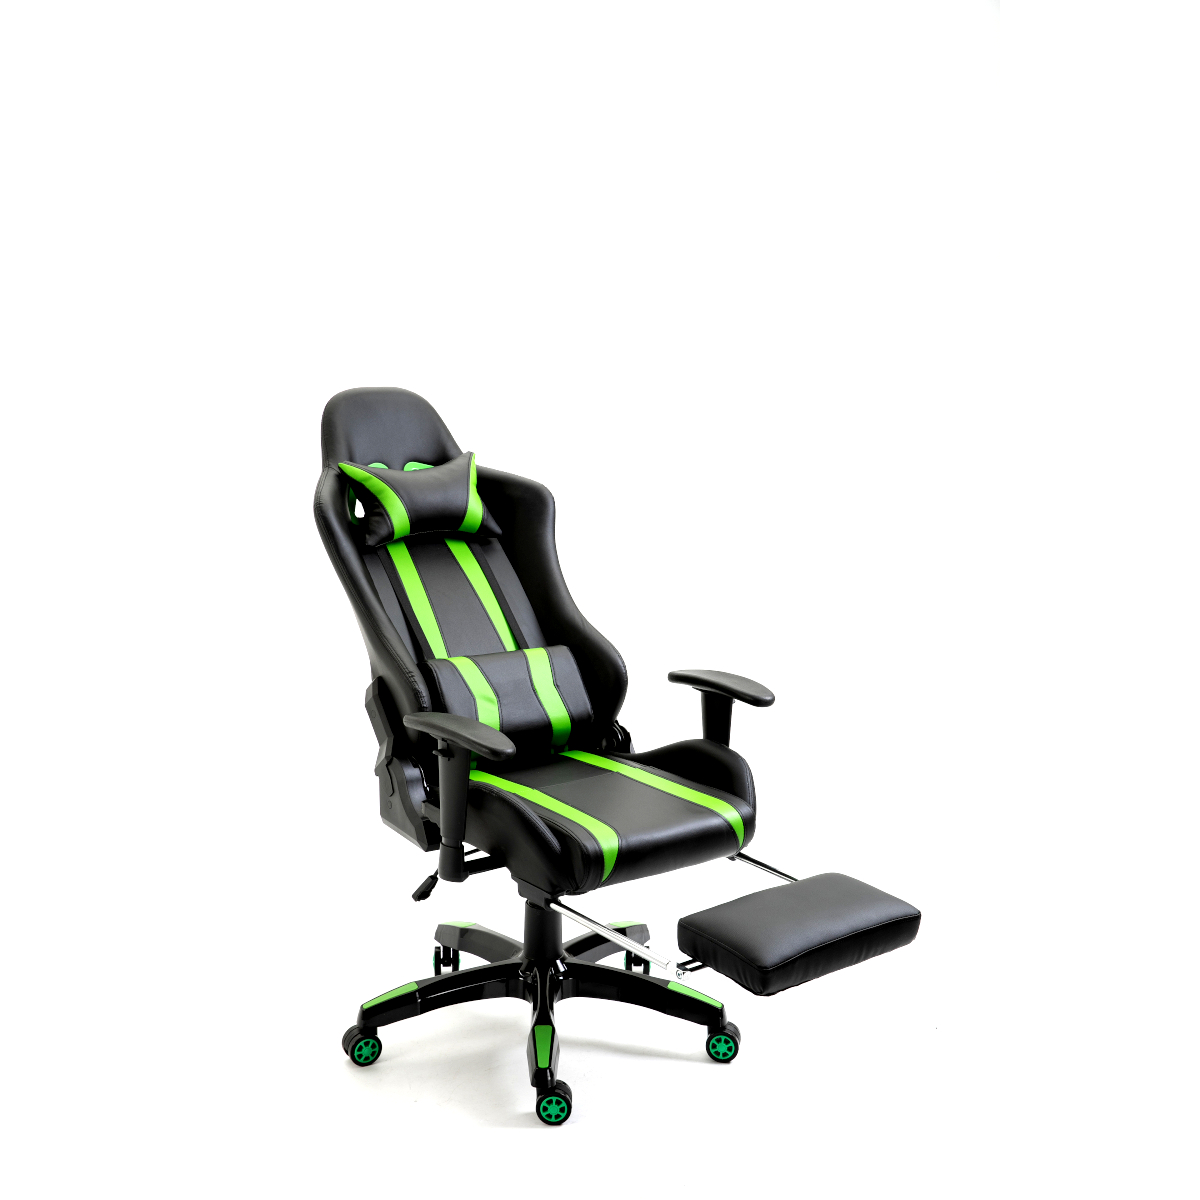 SVITA Gaming Stuhl Schreibtischstuhl Bürostuhl Drehstuhl Schreibtisch (Grün)